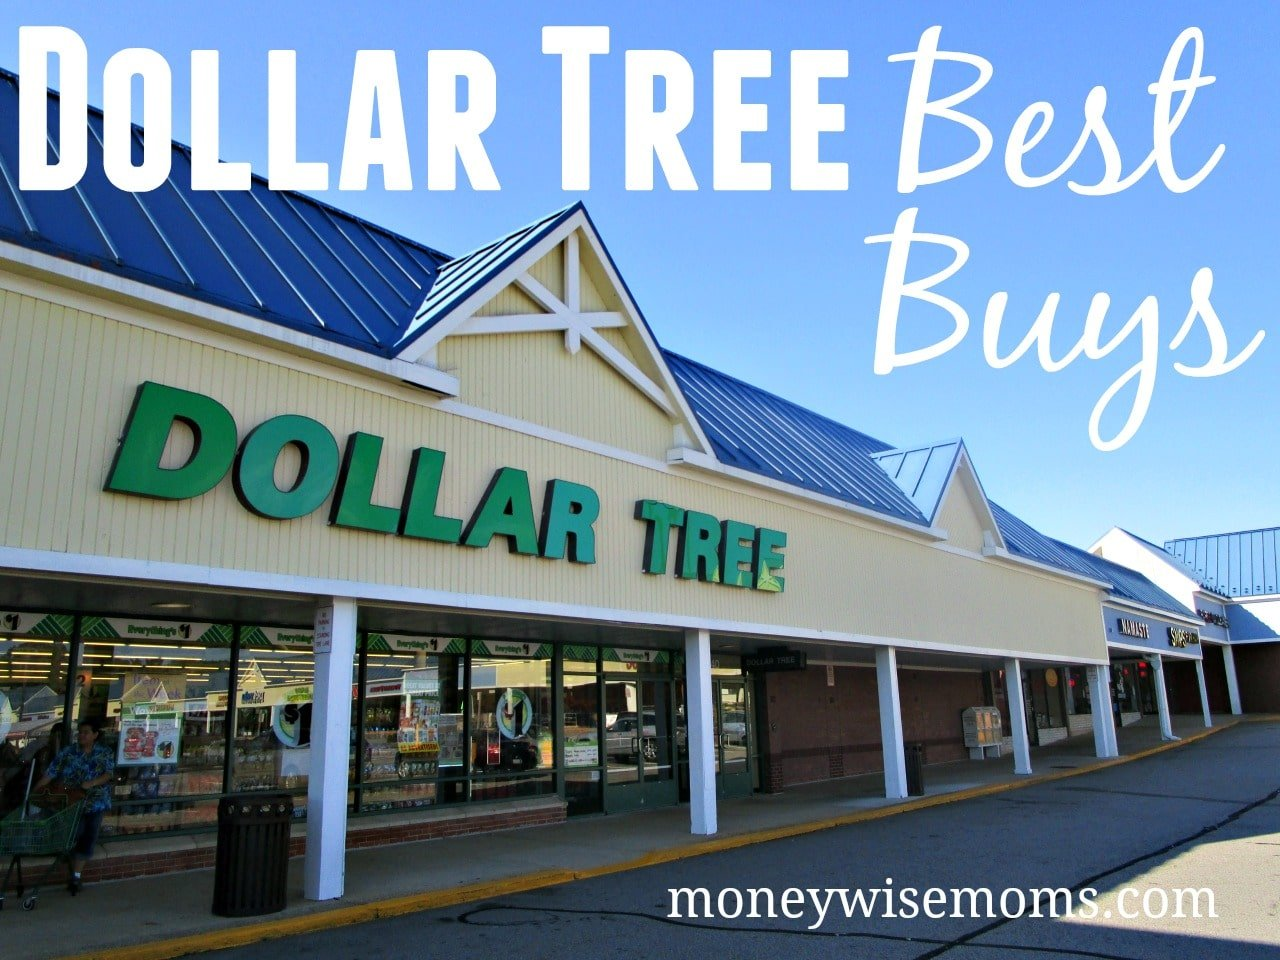 Dollar Tree Best Buys